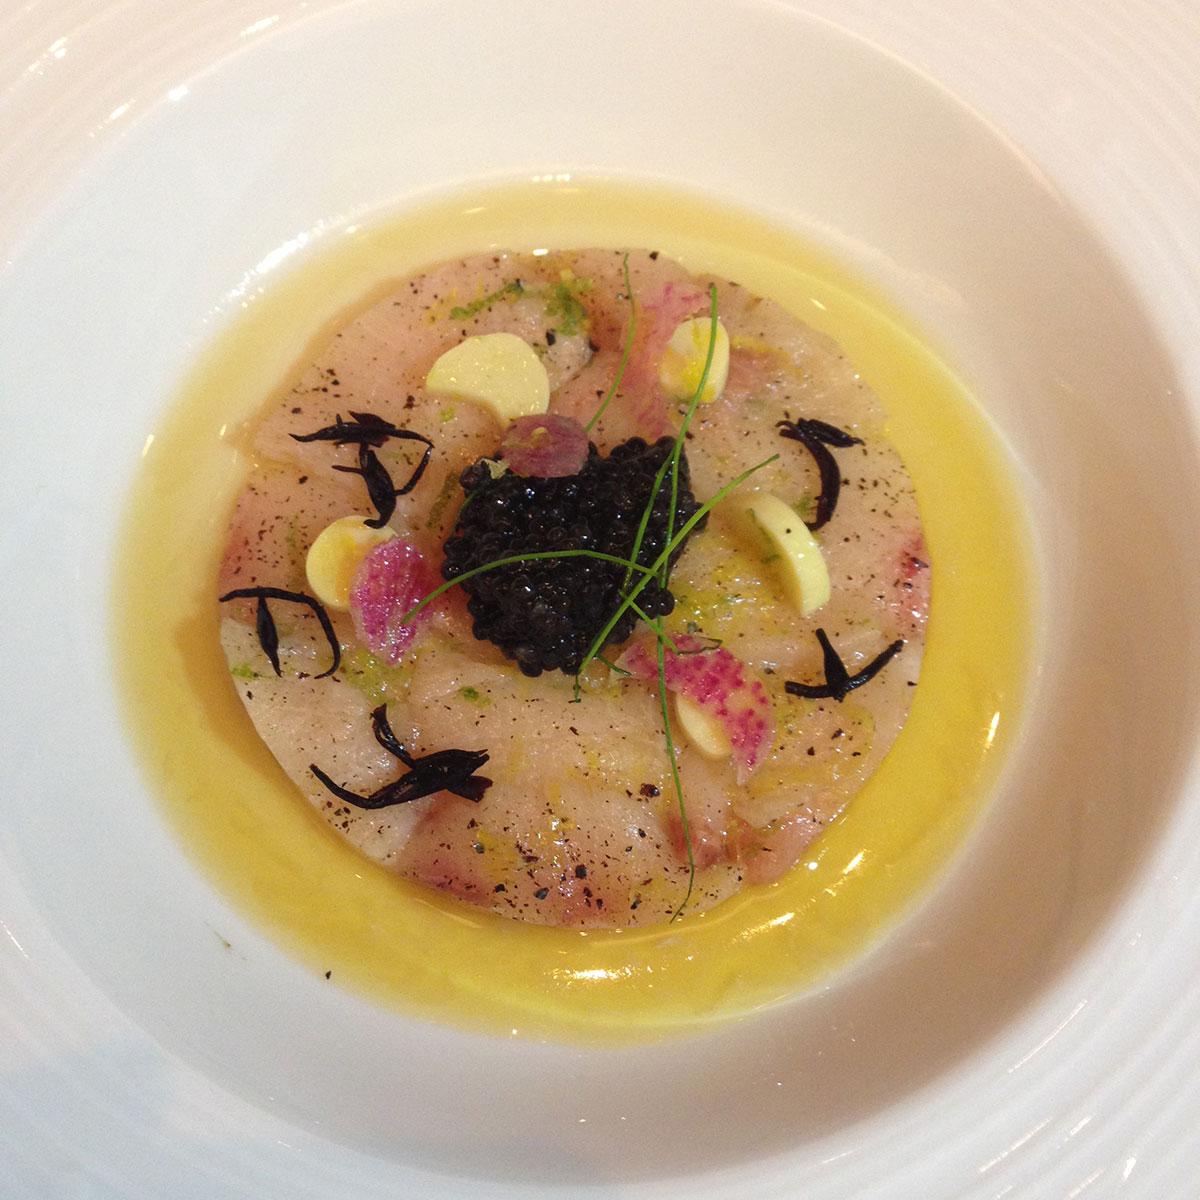 Caviar-Russe-Miami-hamachi-and-caviar